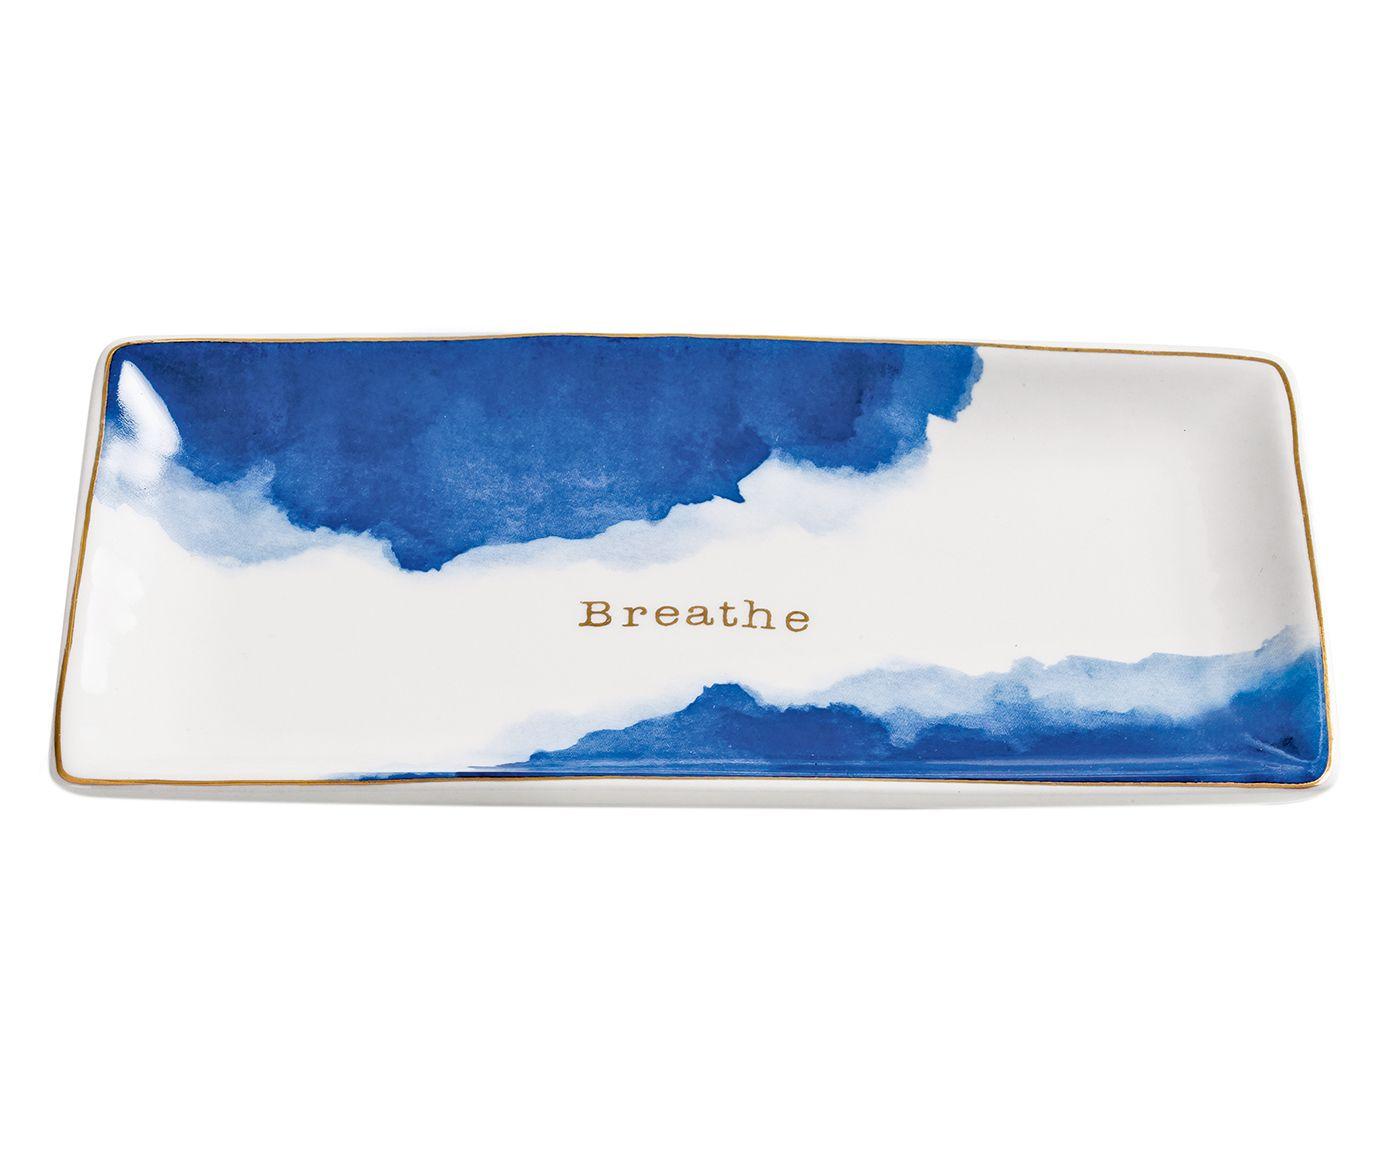 Prato Decorativo Breathe - 19X1,5X10,5cm | Westwing.com.br